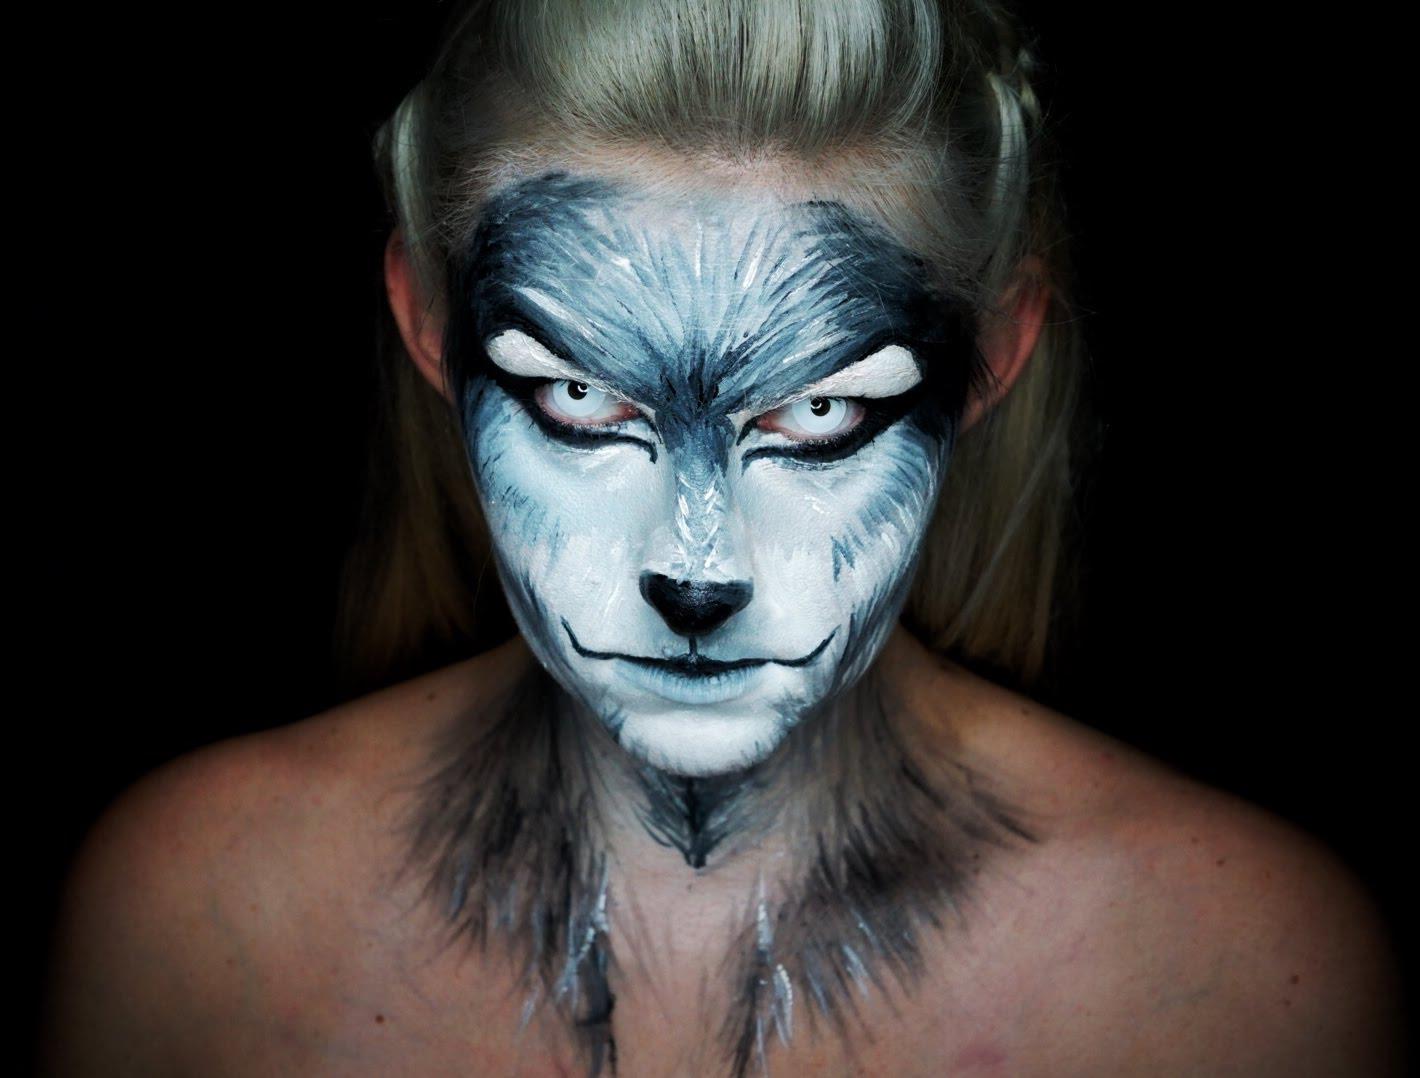 1001 ideas for spooky halloween face paint suggestions 80 spooky halloween face paint suggestions with tutorials diy solutioingenieria Image collections